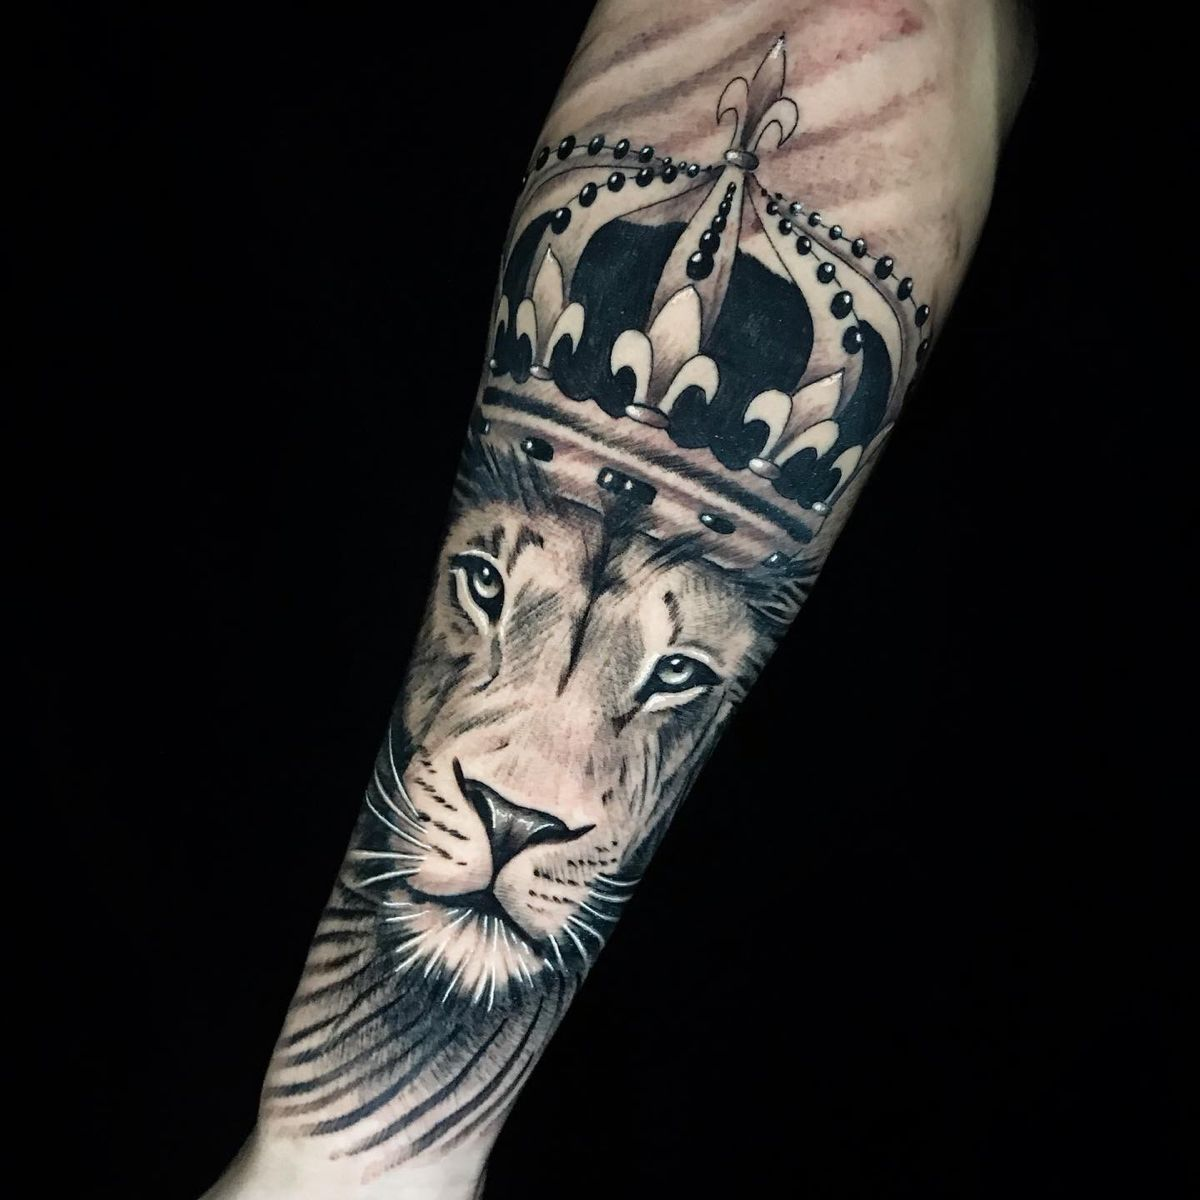 #Tattoo #tattootime #tattooinked #leaotattoo #tattooleao #tatuagem #liontattoo